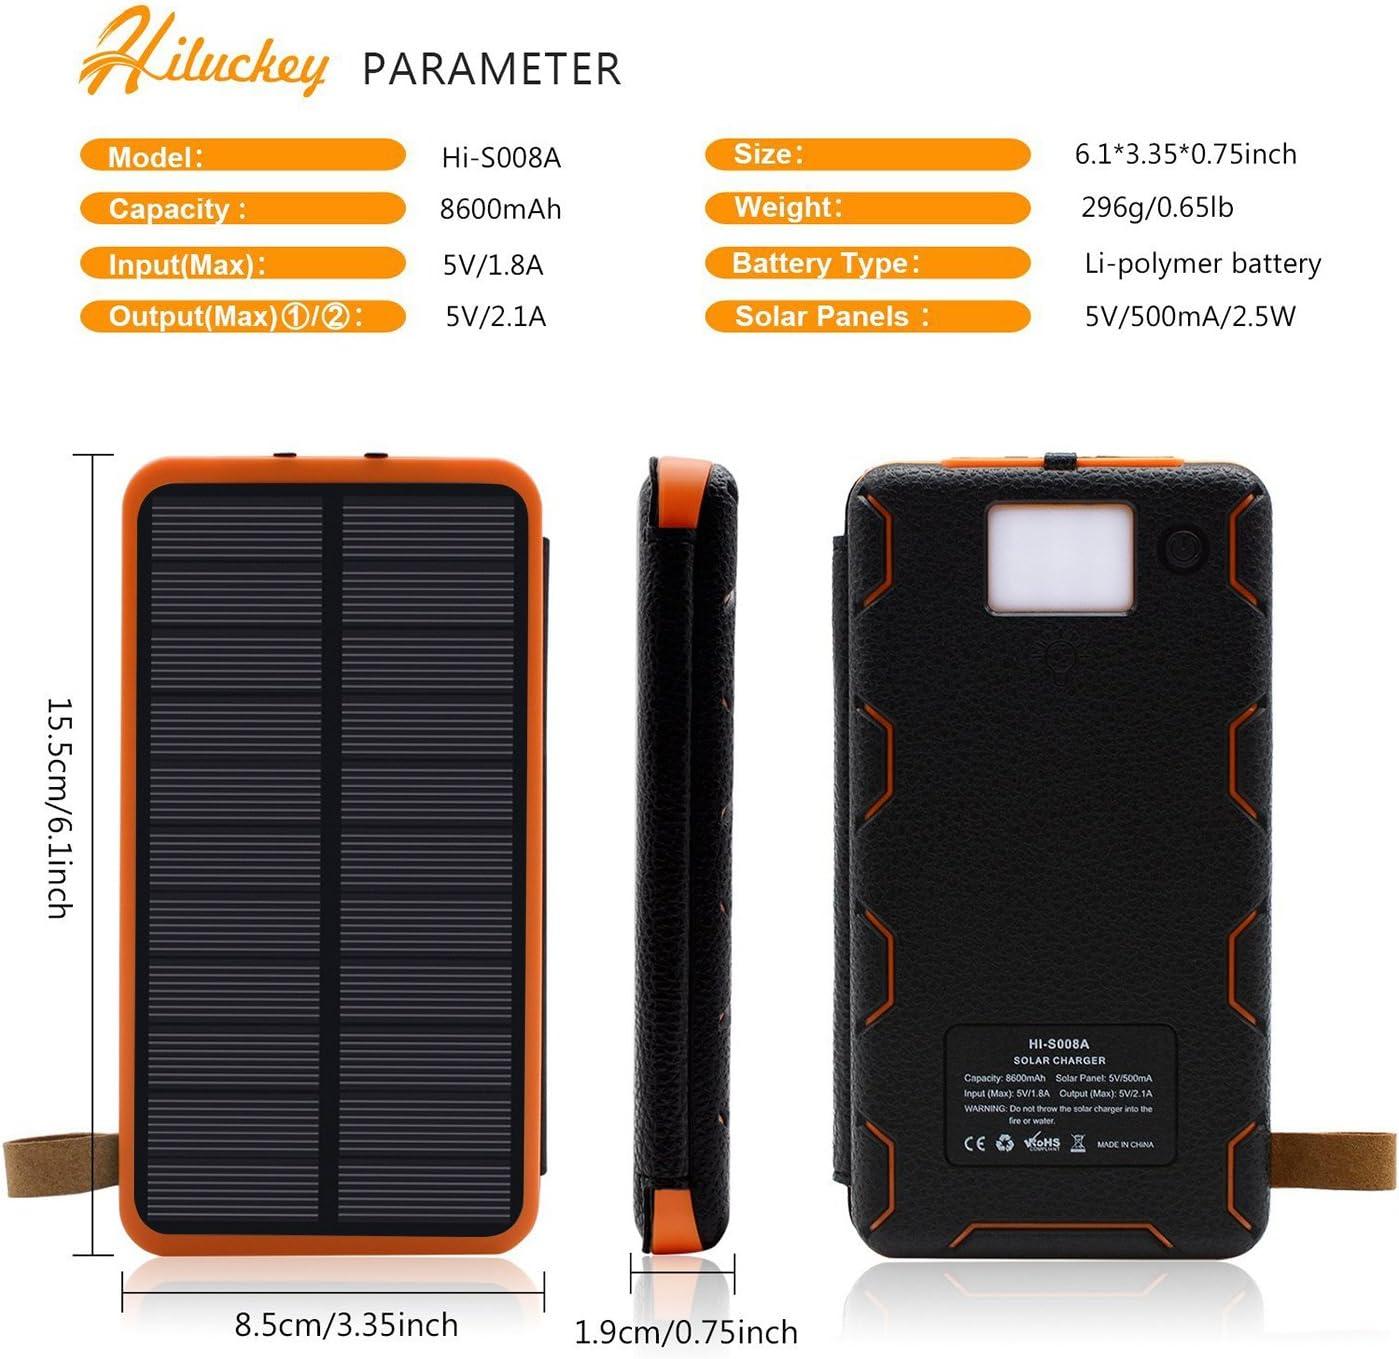 Hiluckey Caricabatterie Portatile 8600mAh Dual USB Batteria